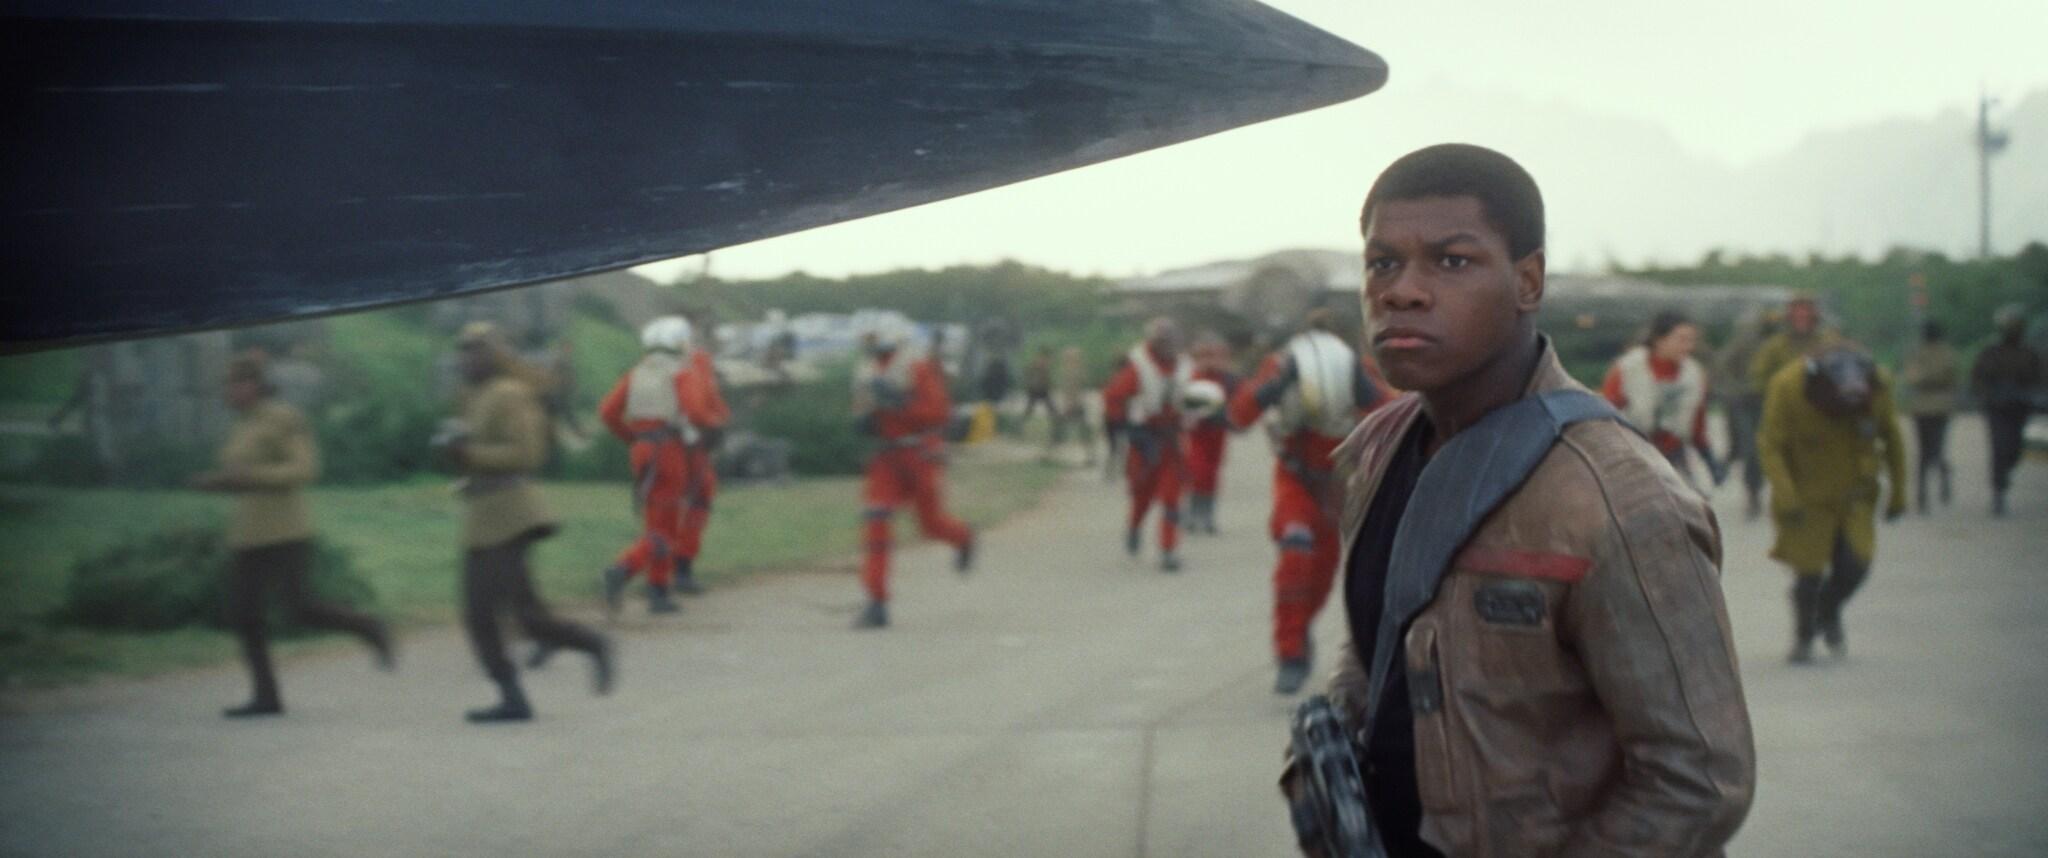 John Boyega as Finn standing in front of Resistance soldiers.